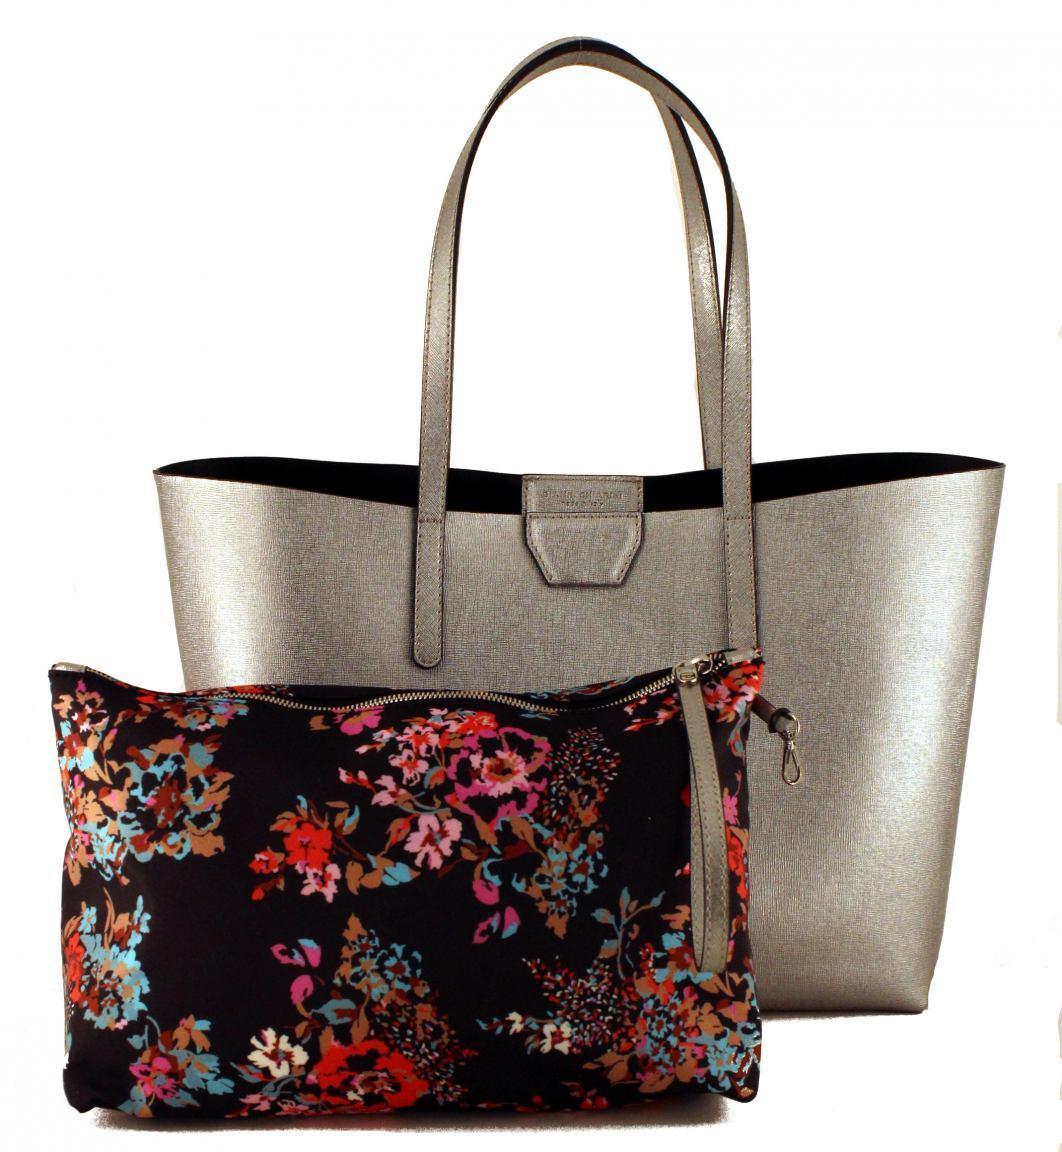 Gianni Chiarini Shoppertasche Silver Innentasche Blumen